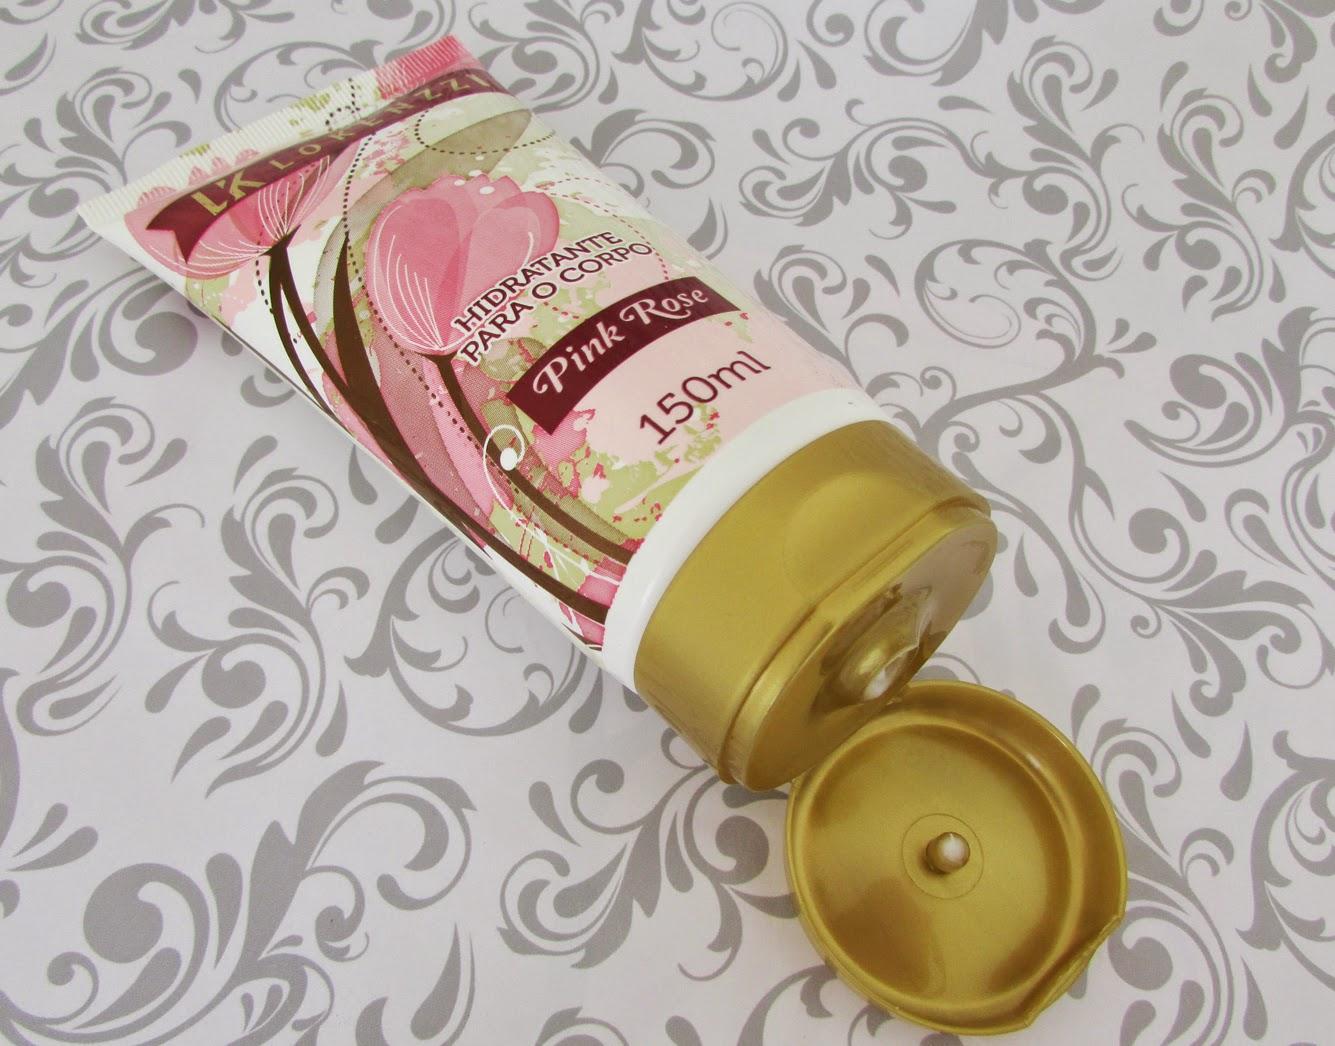 Resenha, Hidratante para o corpo, Pink Rose, Lokenzzi